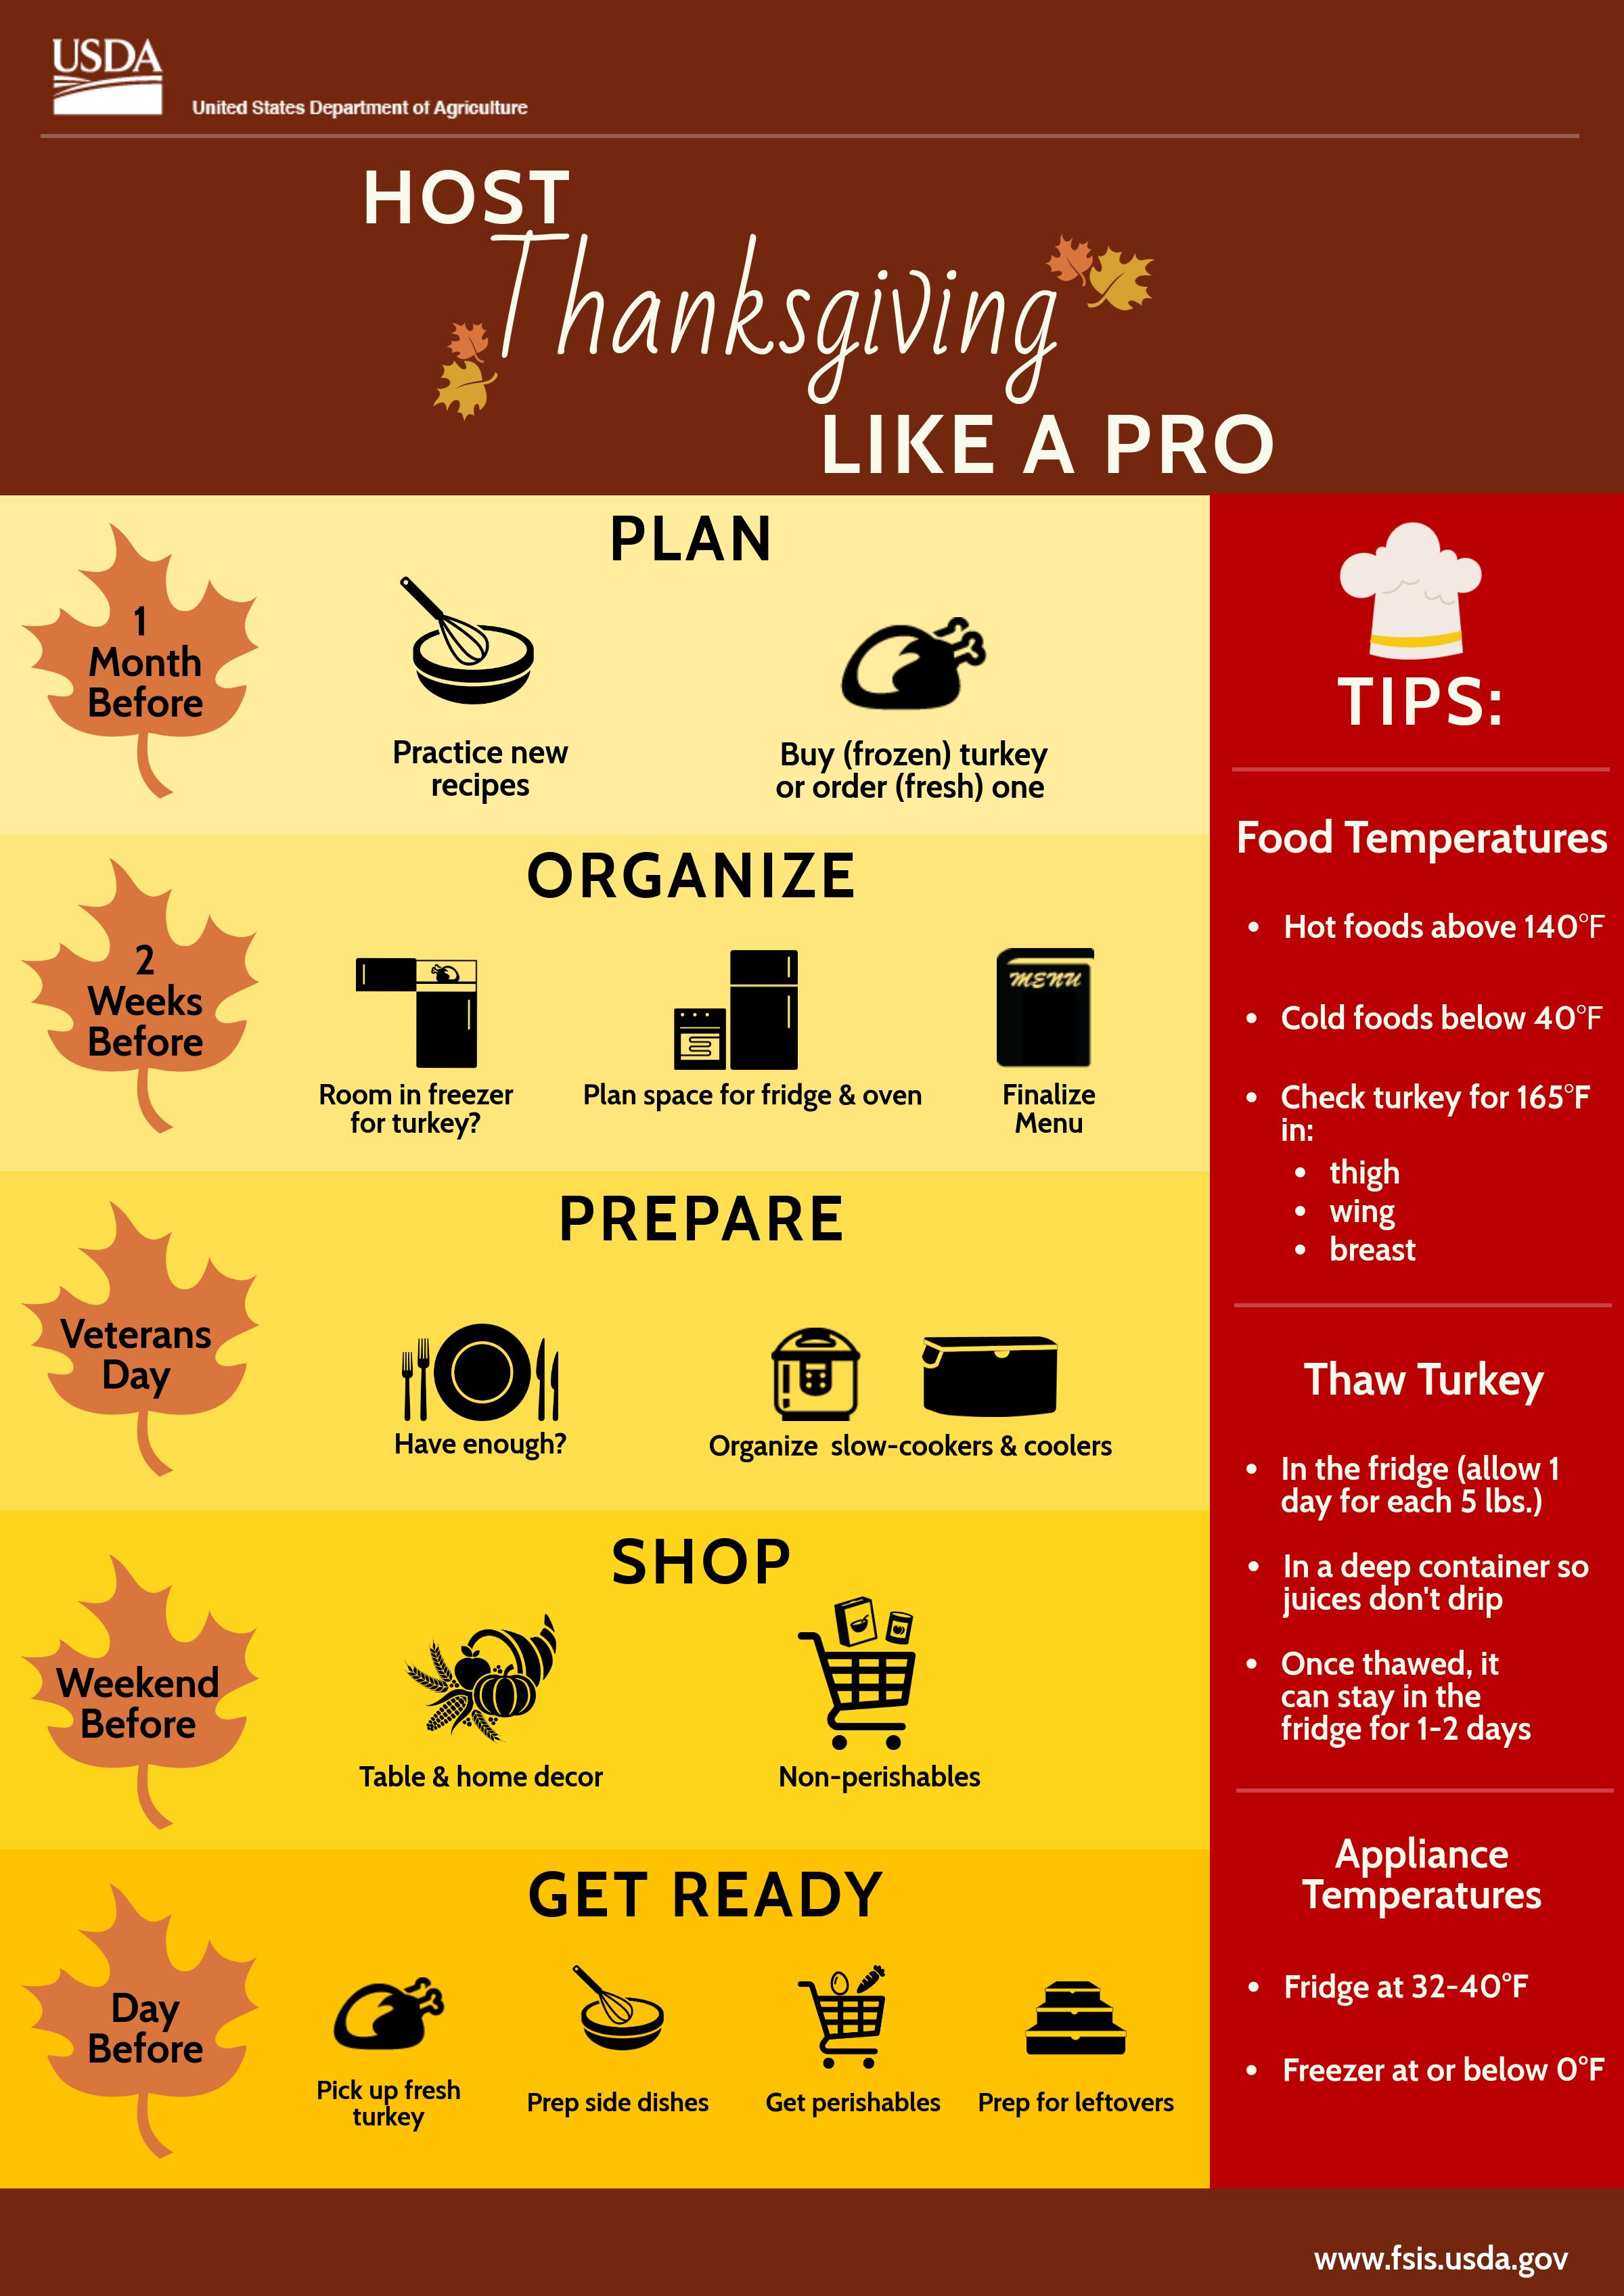 ThanksgivingTimeline Infographic Hosting thanksgiving